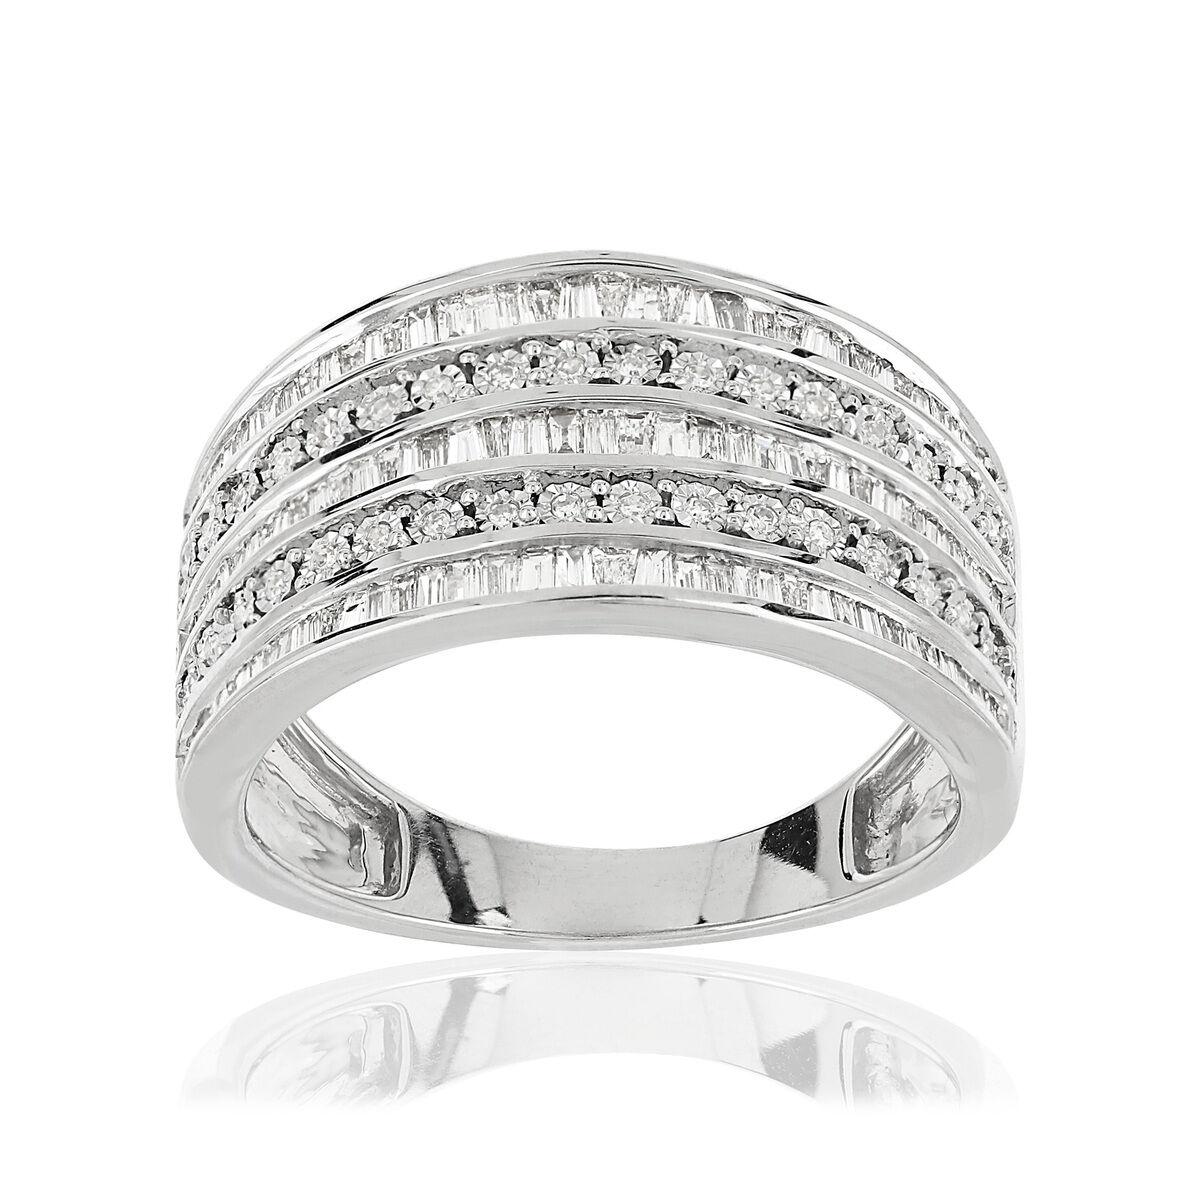 MATY Bague or 750 blanc diamants 0,5 carat- MATY